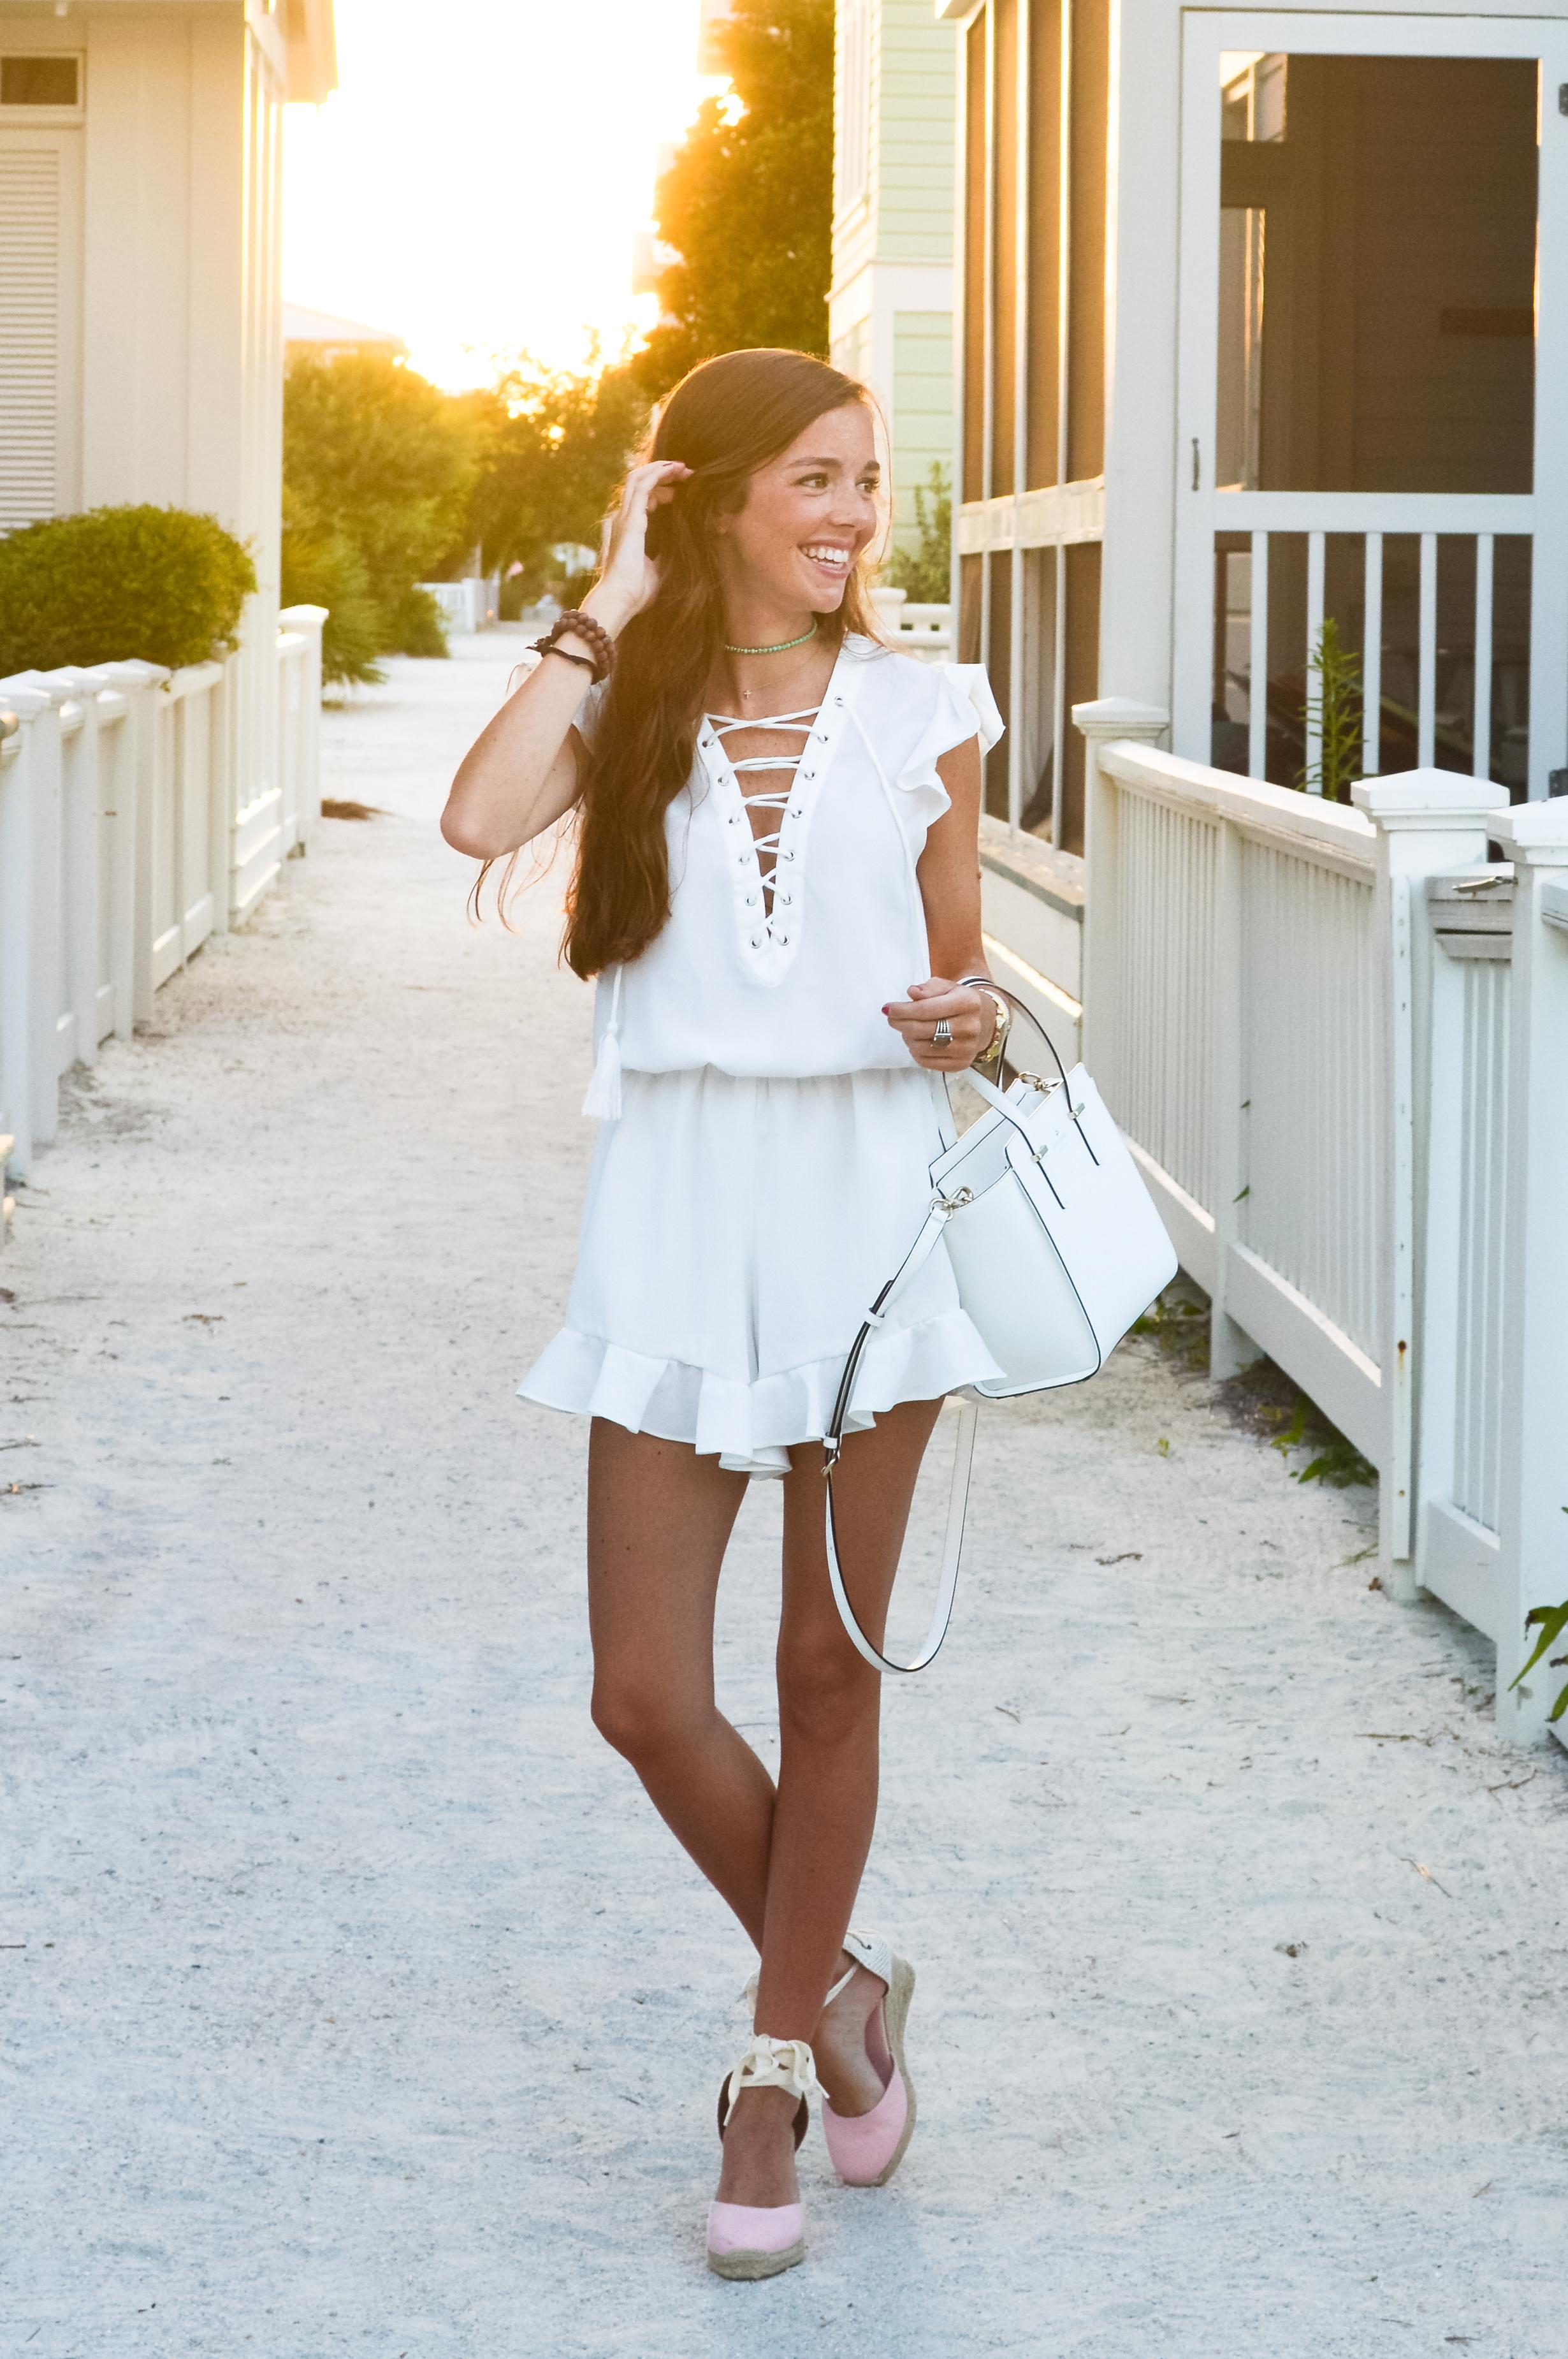 lcb_style_fashion_blogger_whiteromper (1 of 1).jpg